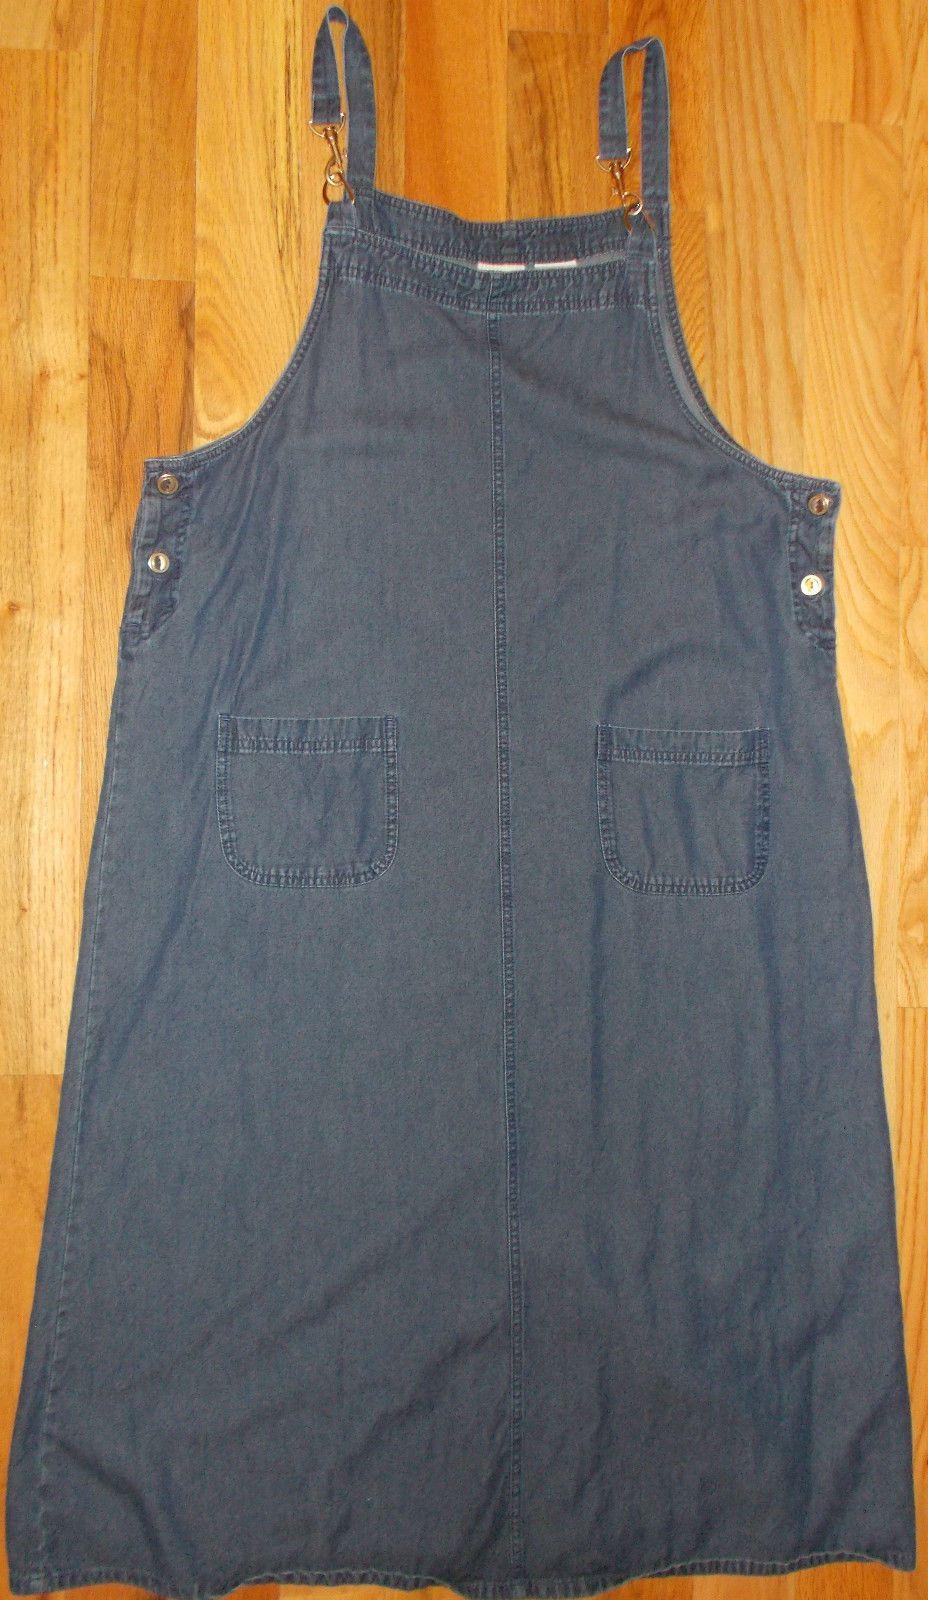 Denim Jumper Dress XL Womens 16 18 MIDI Blue Sleeveless Buckles White Stag 4R3 | eBay